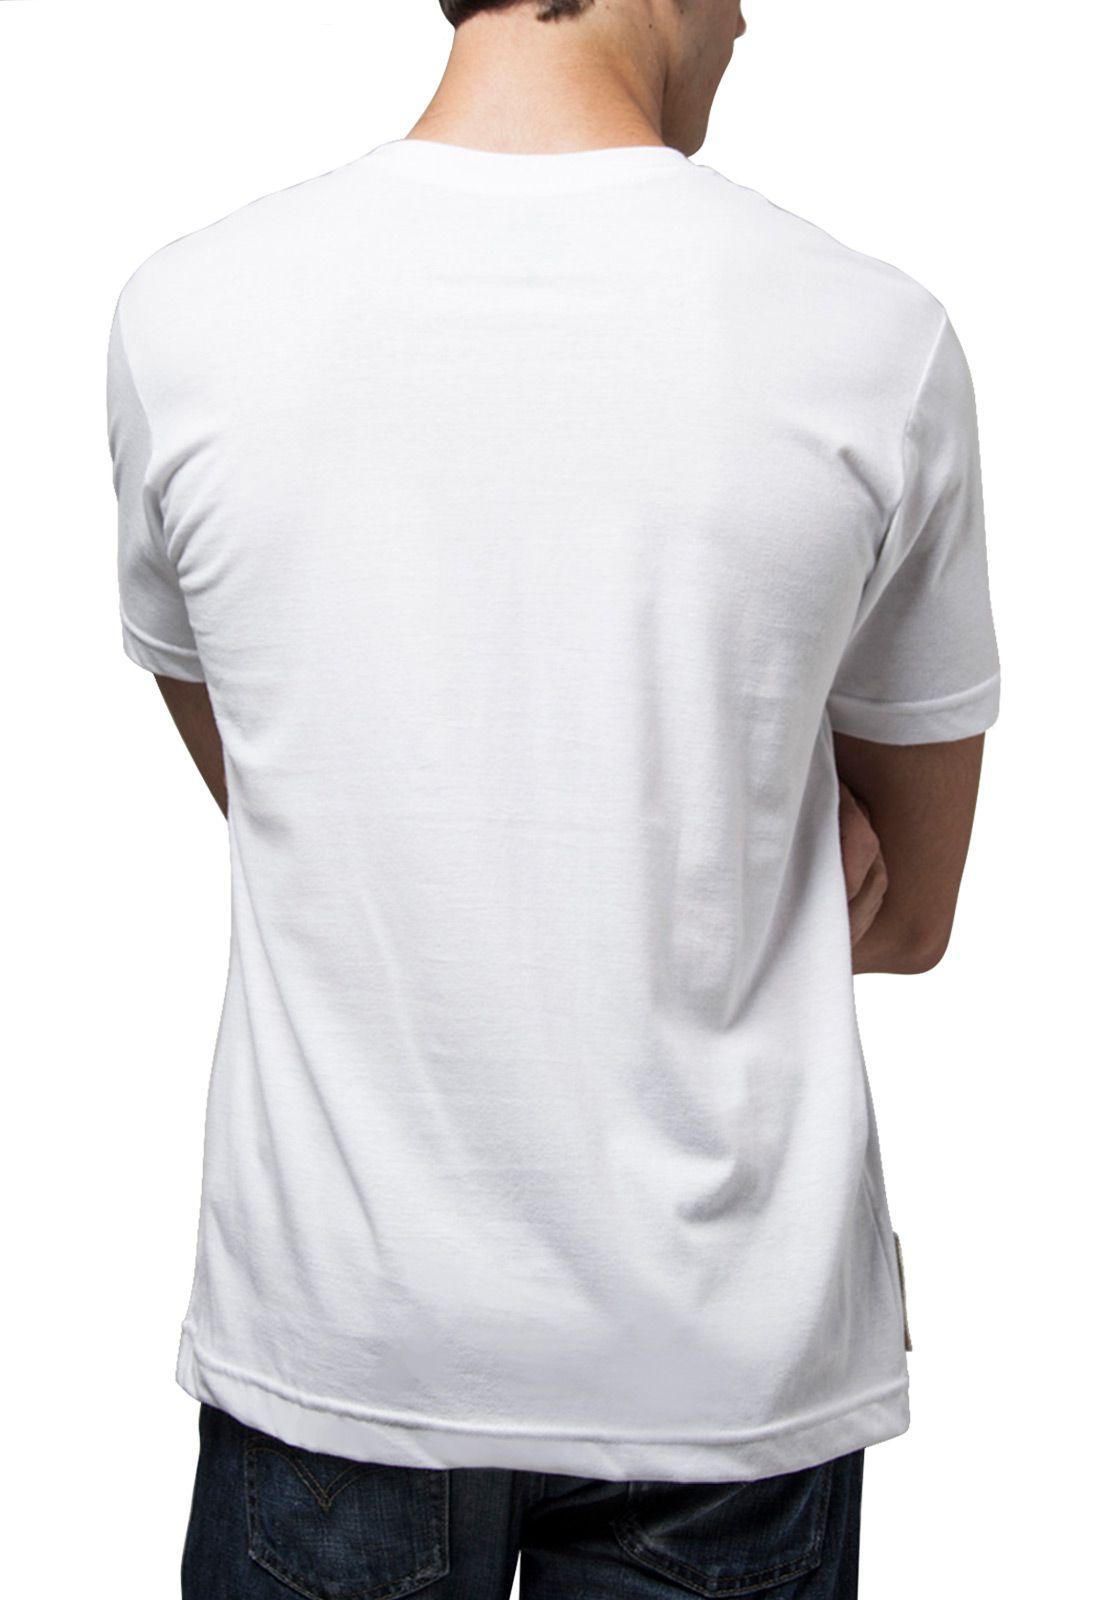 Camiseta Amazônia SOS Mico - Branco